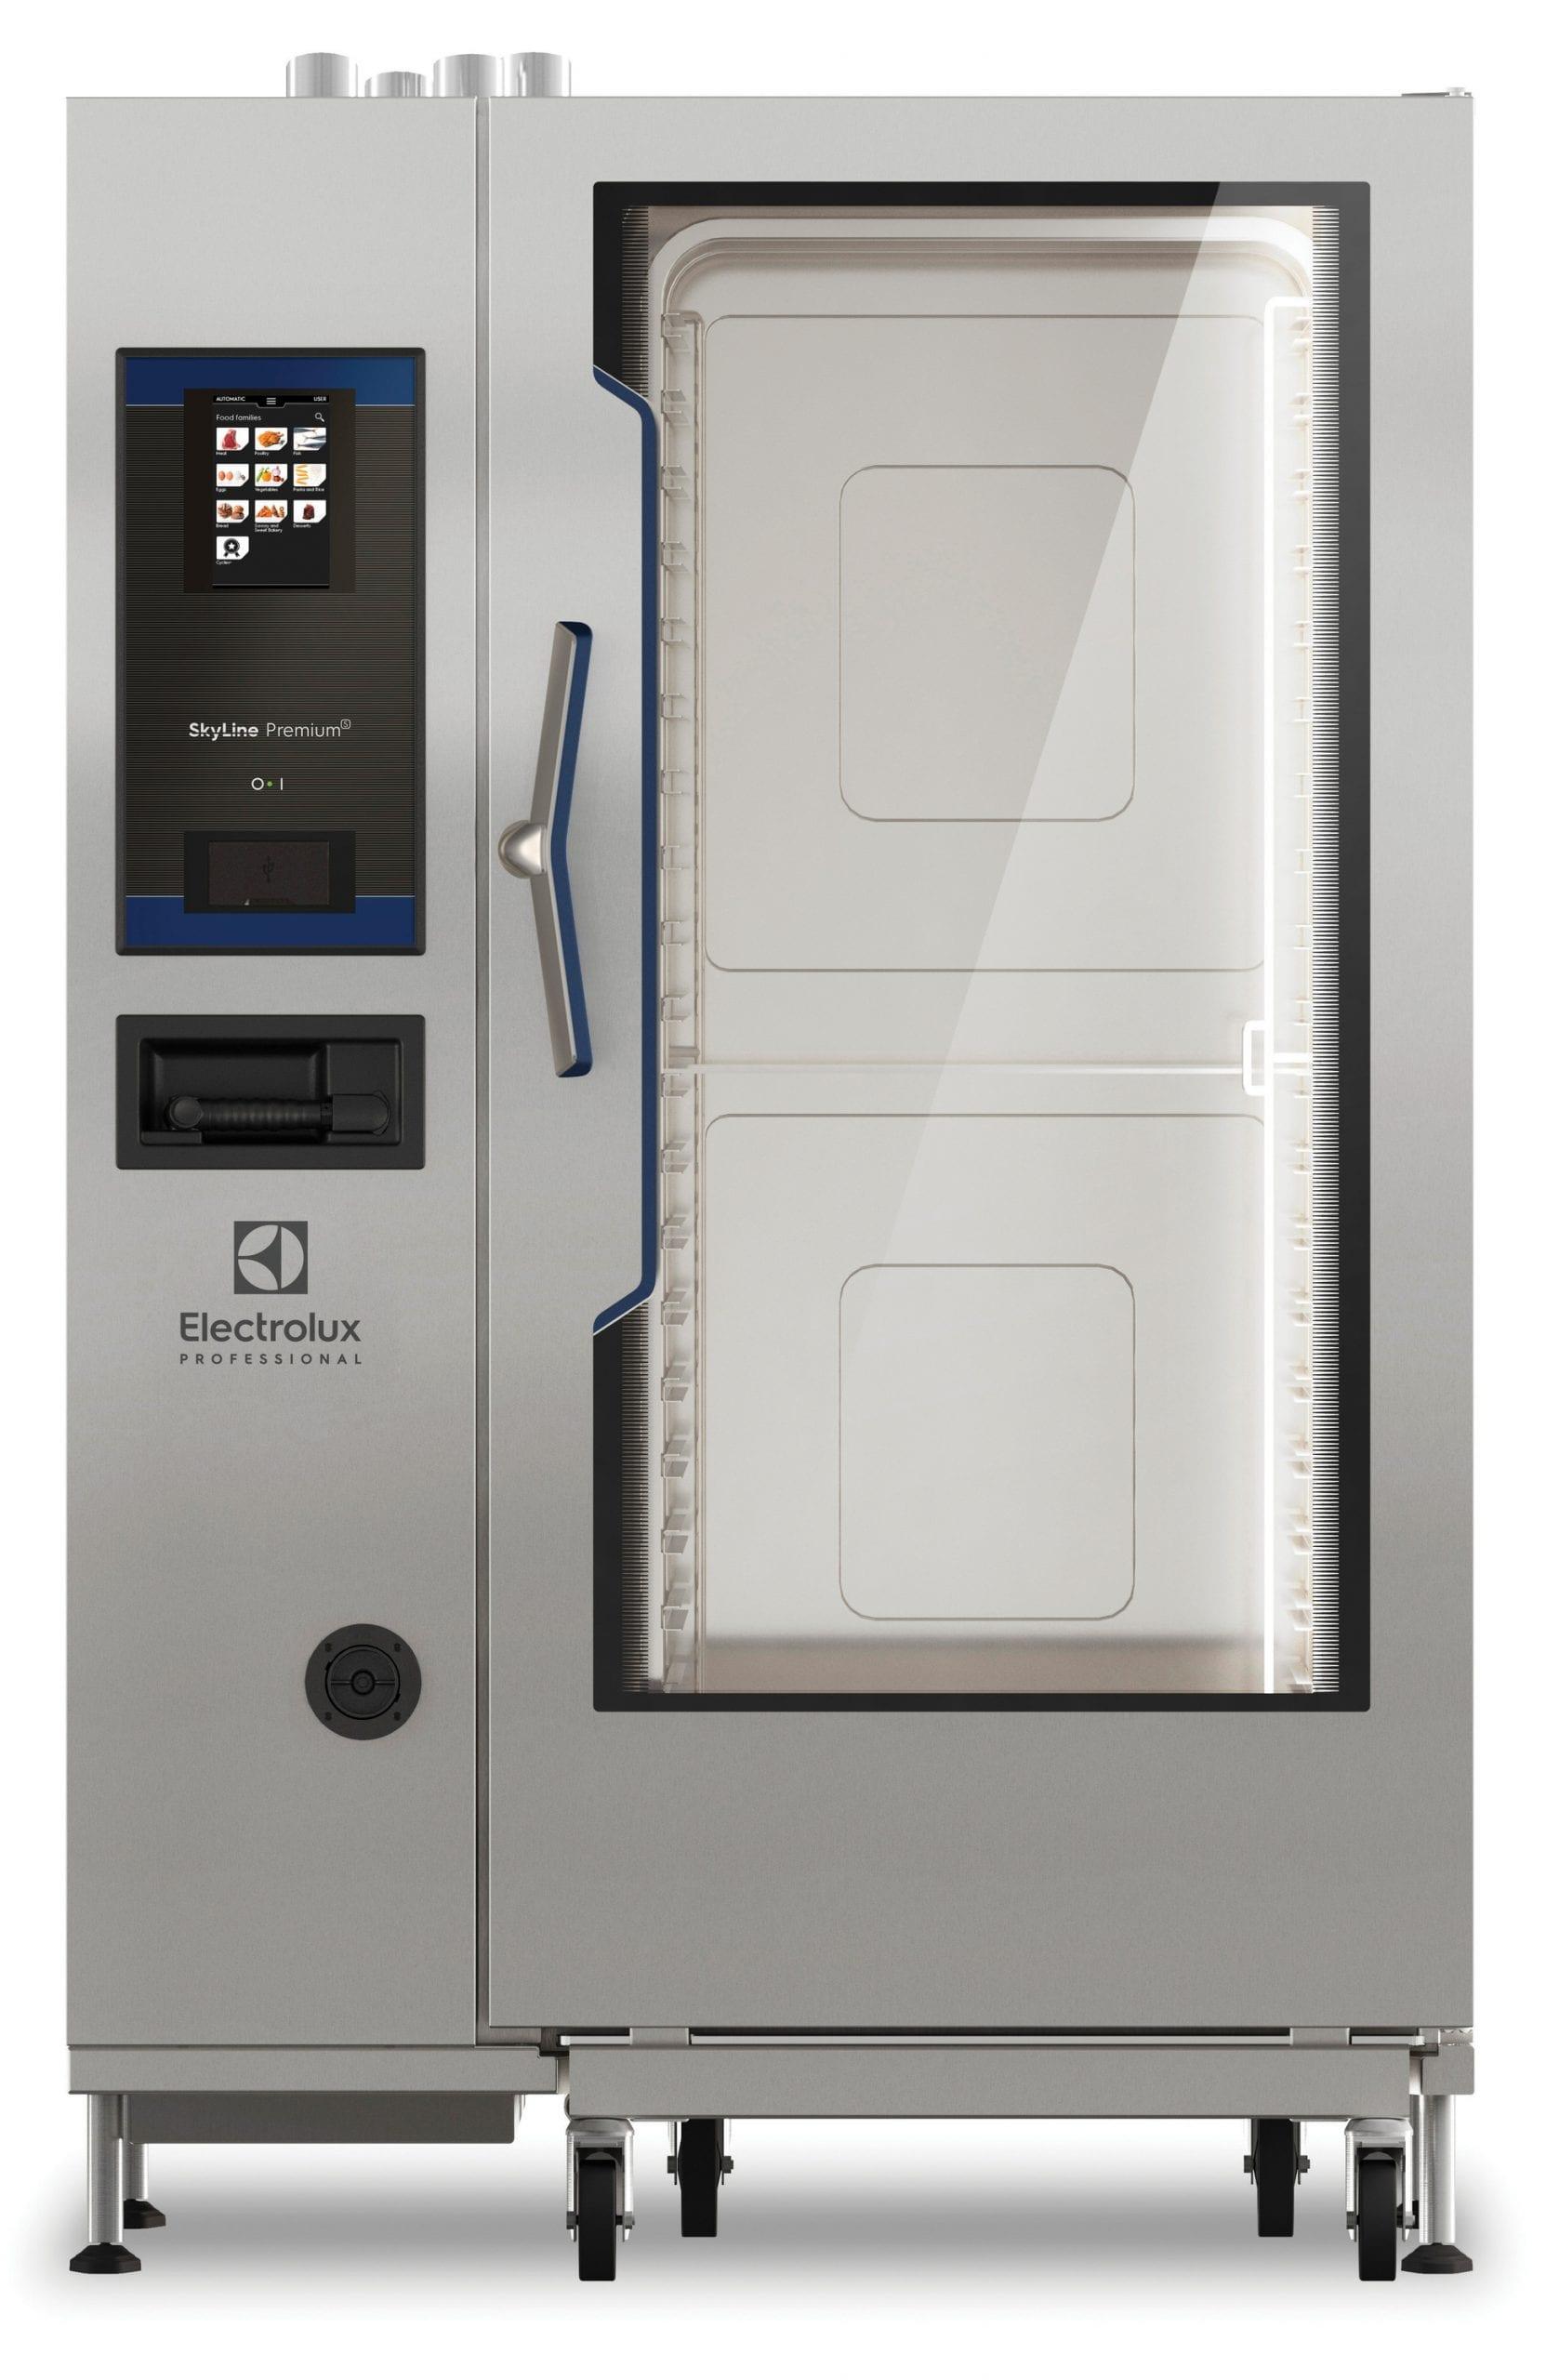 Combi Oven Skyline Premium S 20 GN 2/1 Image